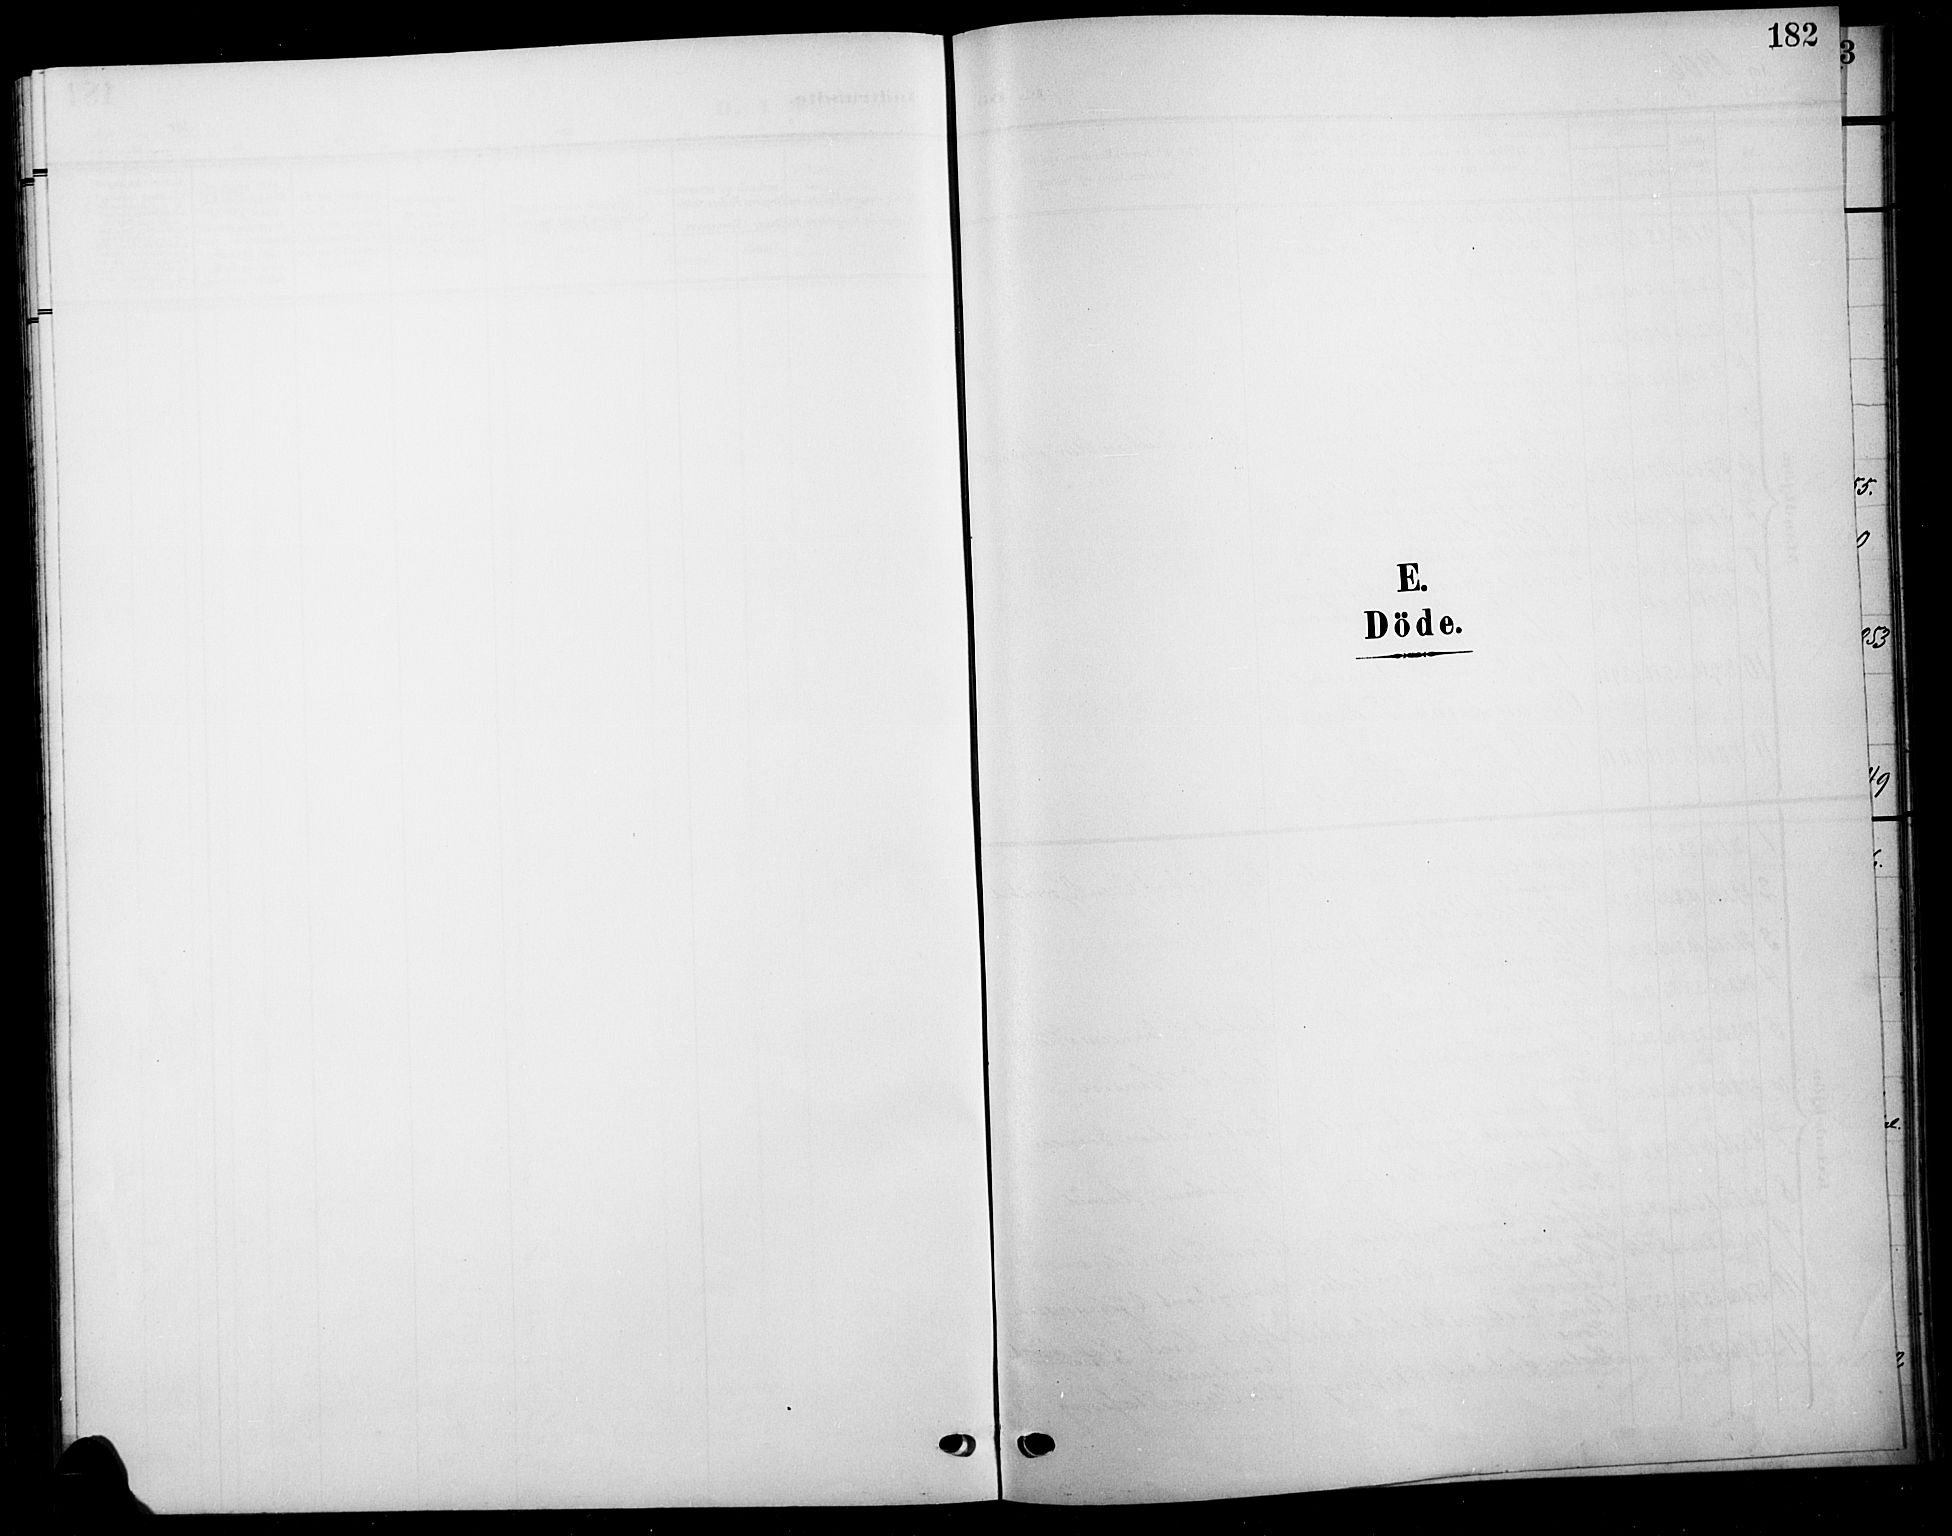 SAH, Biri prestekontor, Klokkerbok nr. 5, 1906-1919, s. 182